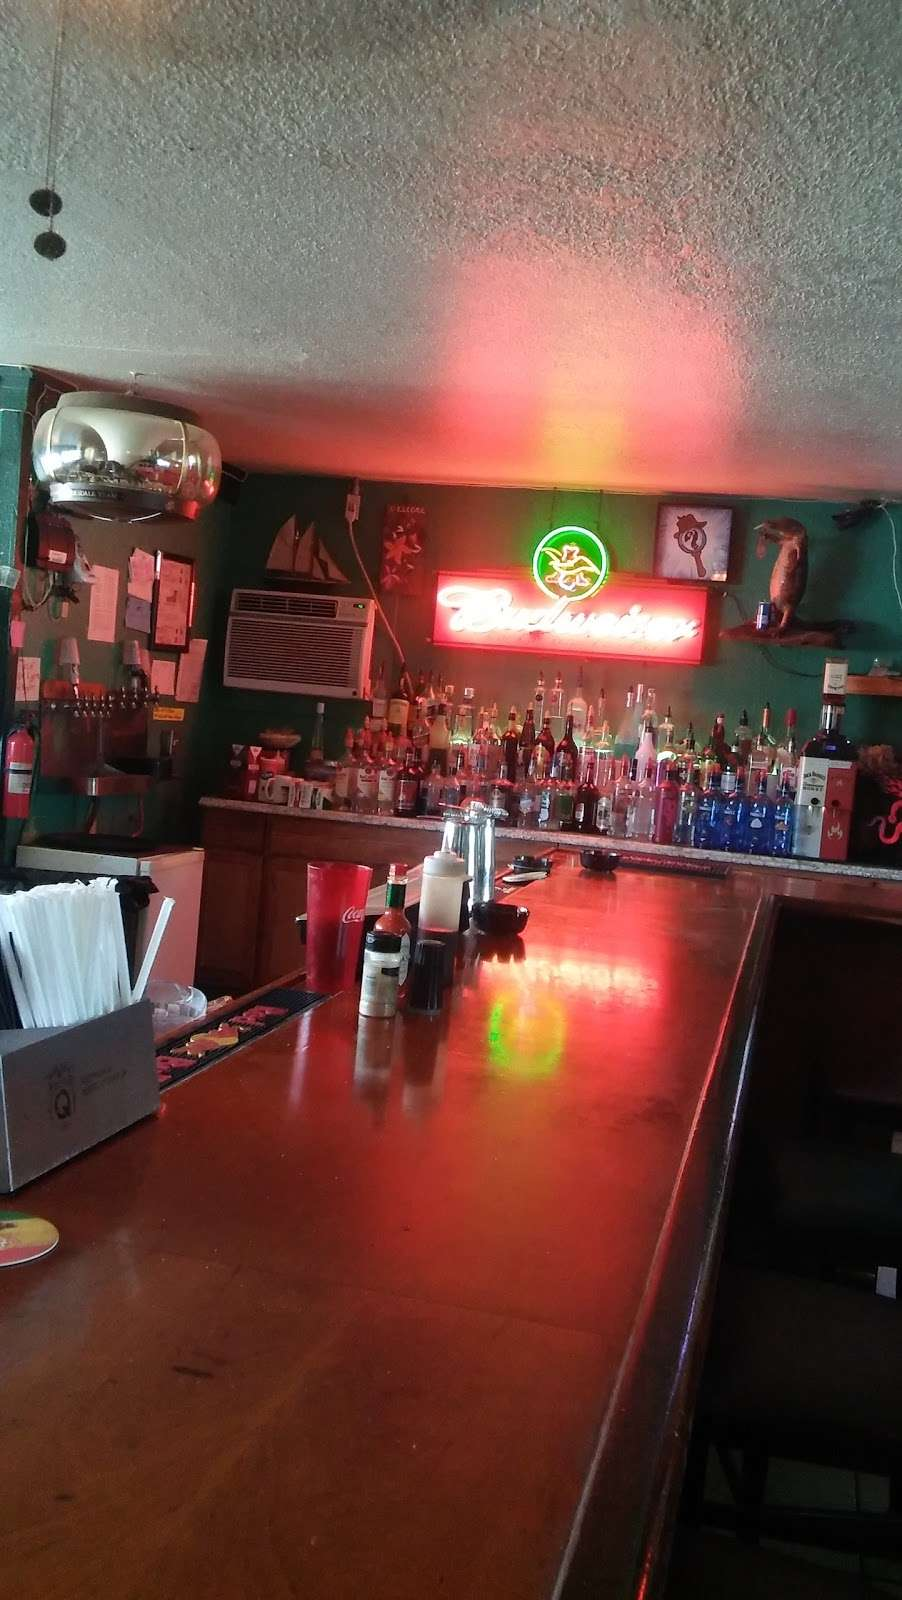 Cozy Cove Inn - lodging  | Photo 2 of 7 | Address: 5790 Alligator Lake Shore W, St Cloud, FL 34771, USA | Phone: (201) 283-7005